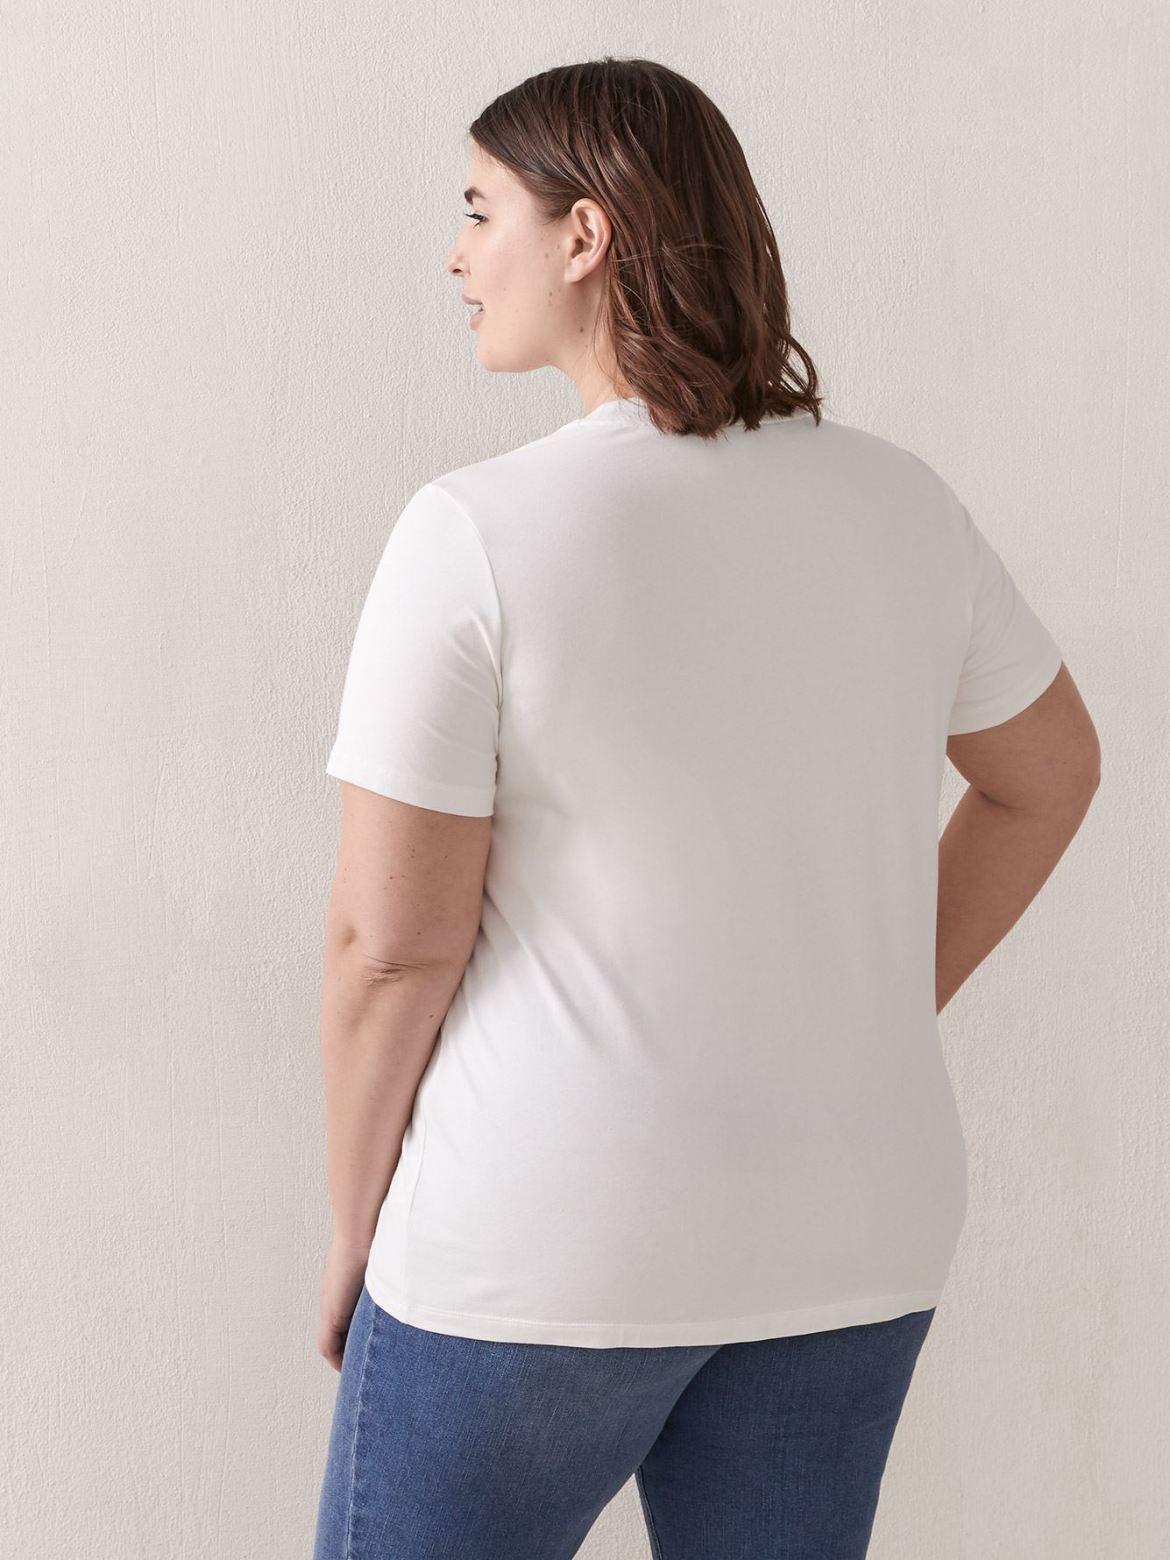 Cotton Original Trefoil Short Sleeve T-Shirt - adidas